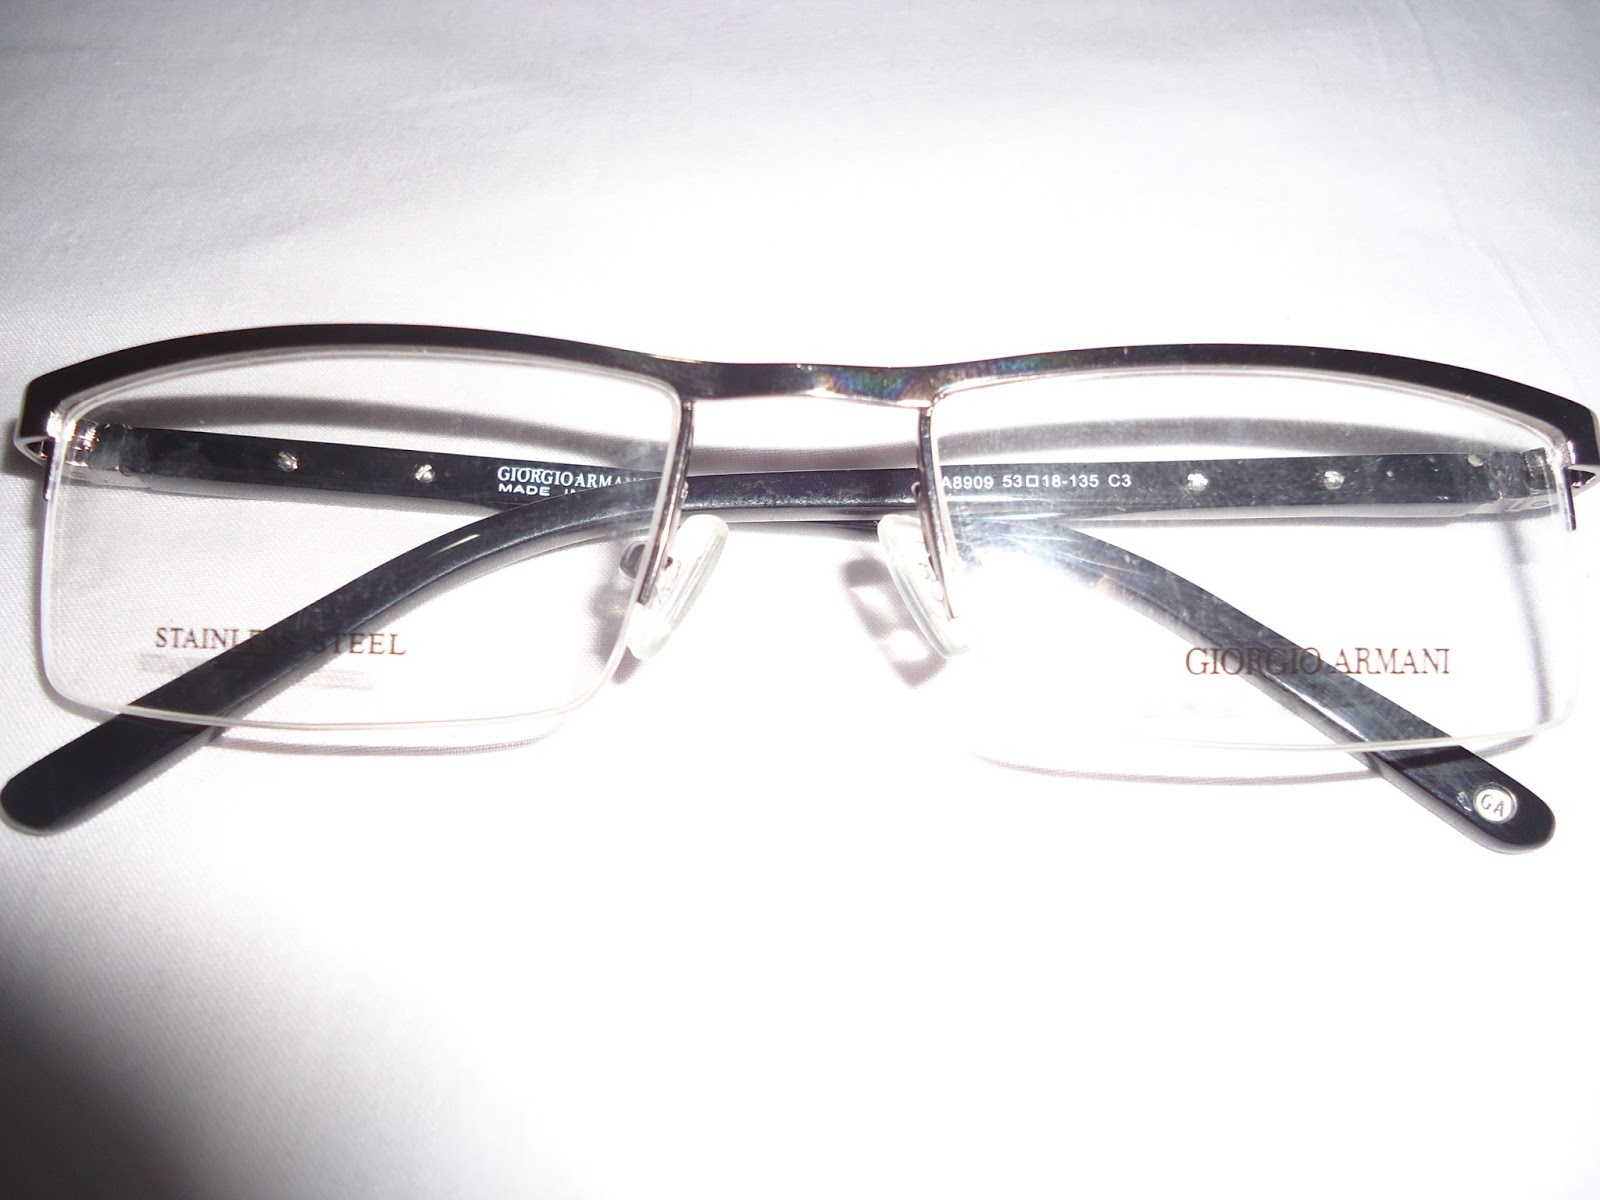 Armani Rimless Glasses Frames : Buy Frames, Sunglasses,Contact lenses : GIORGIO ARMANI ...